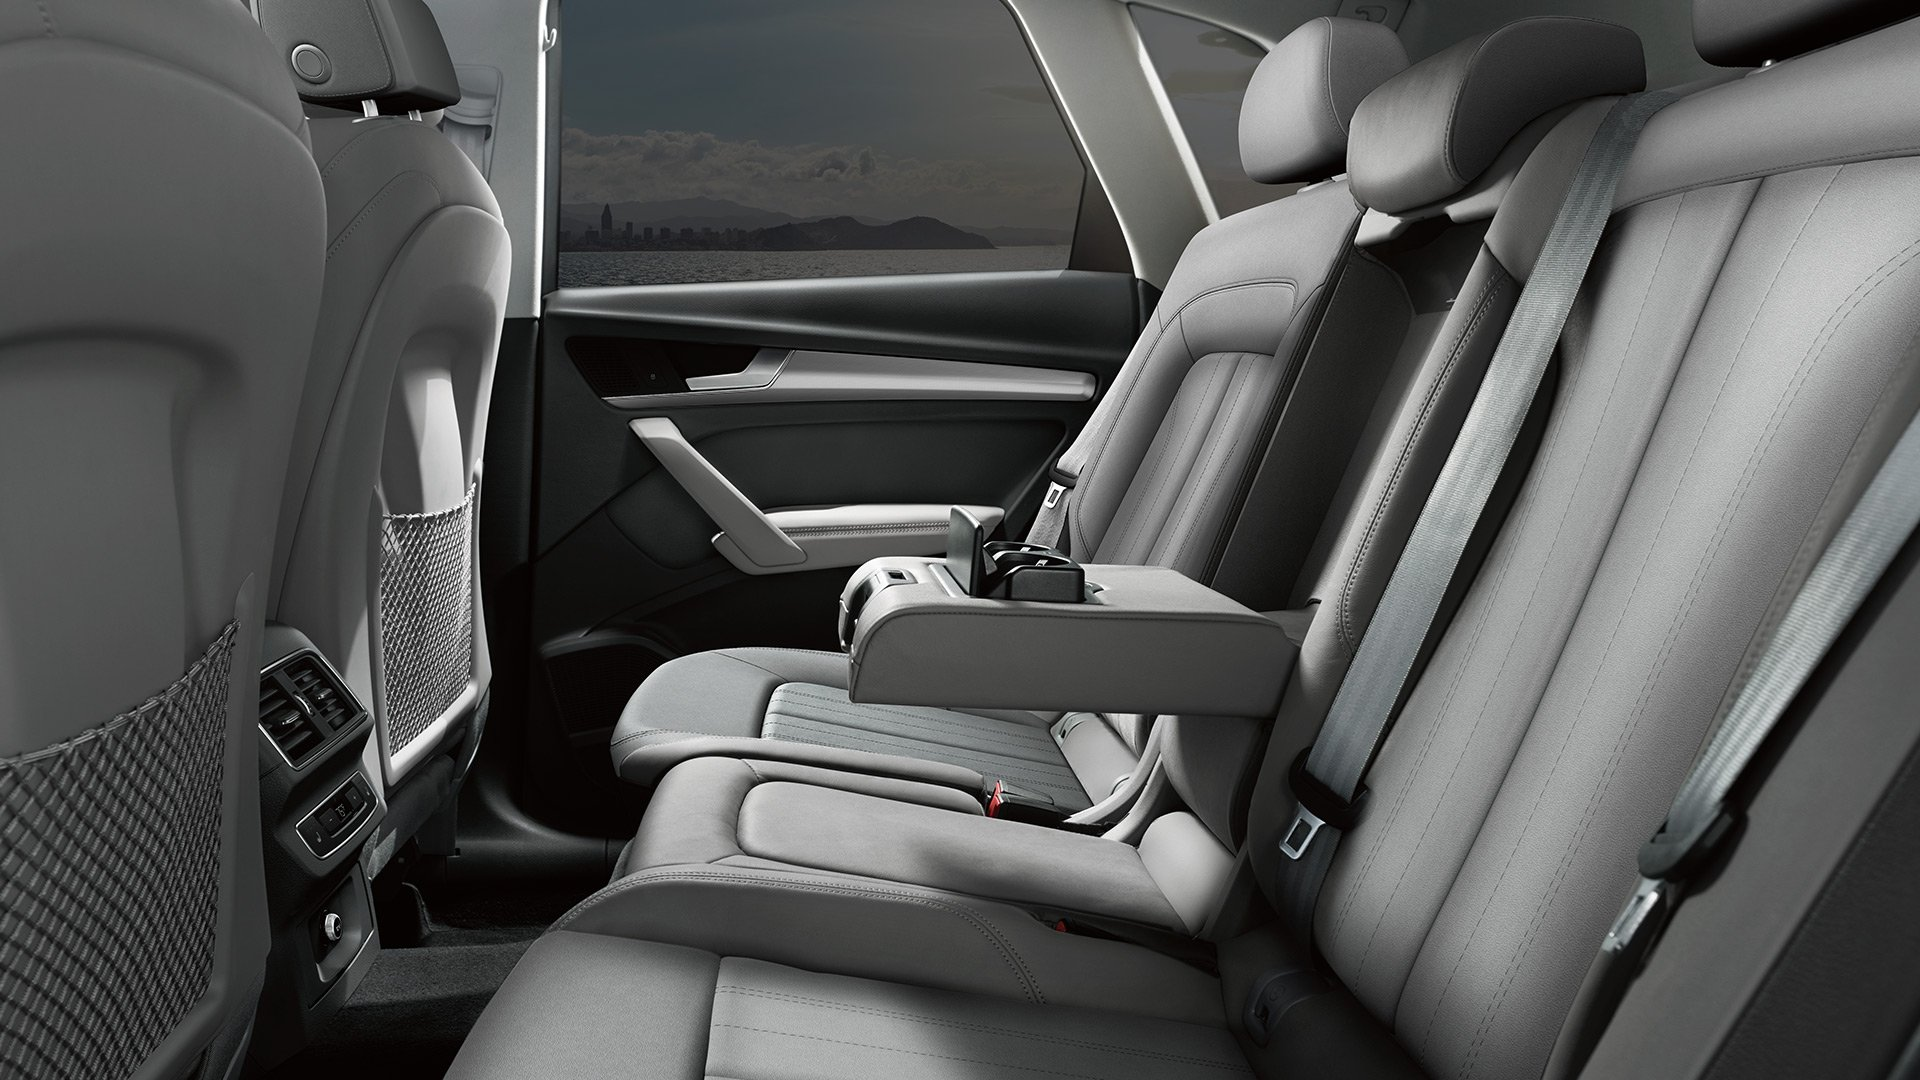 Audi Q Financing In Austin TX Aston Martin Of Austin - Austin audi